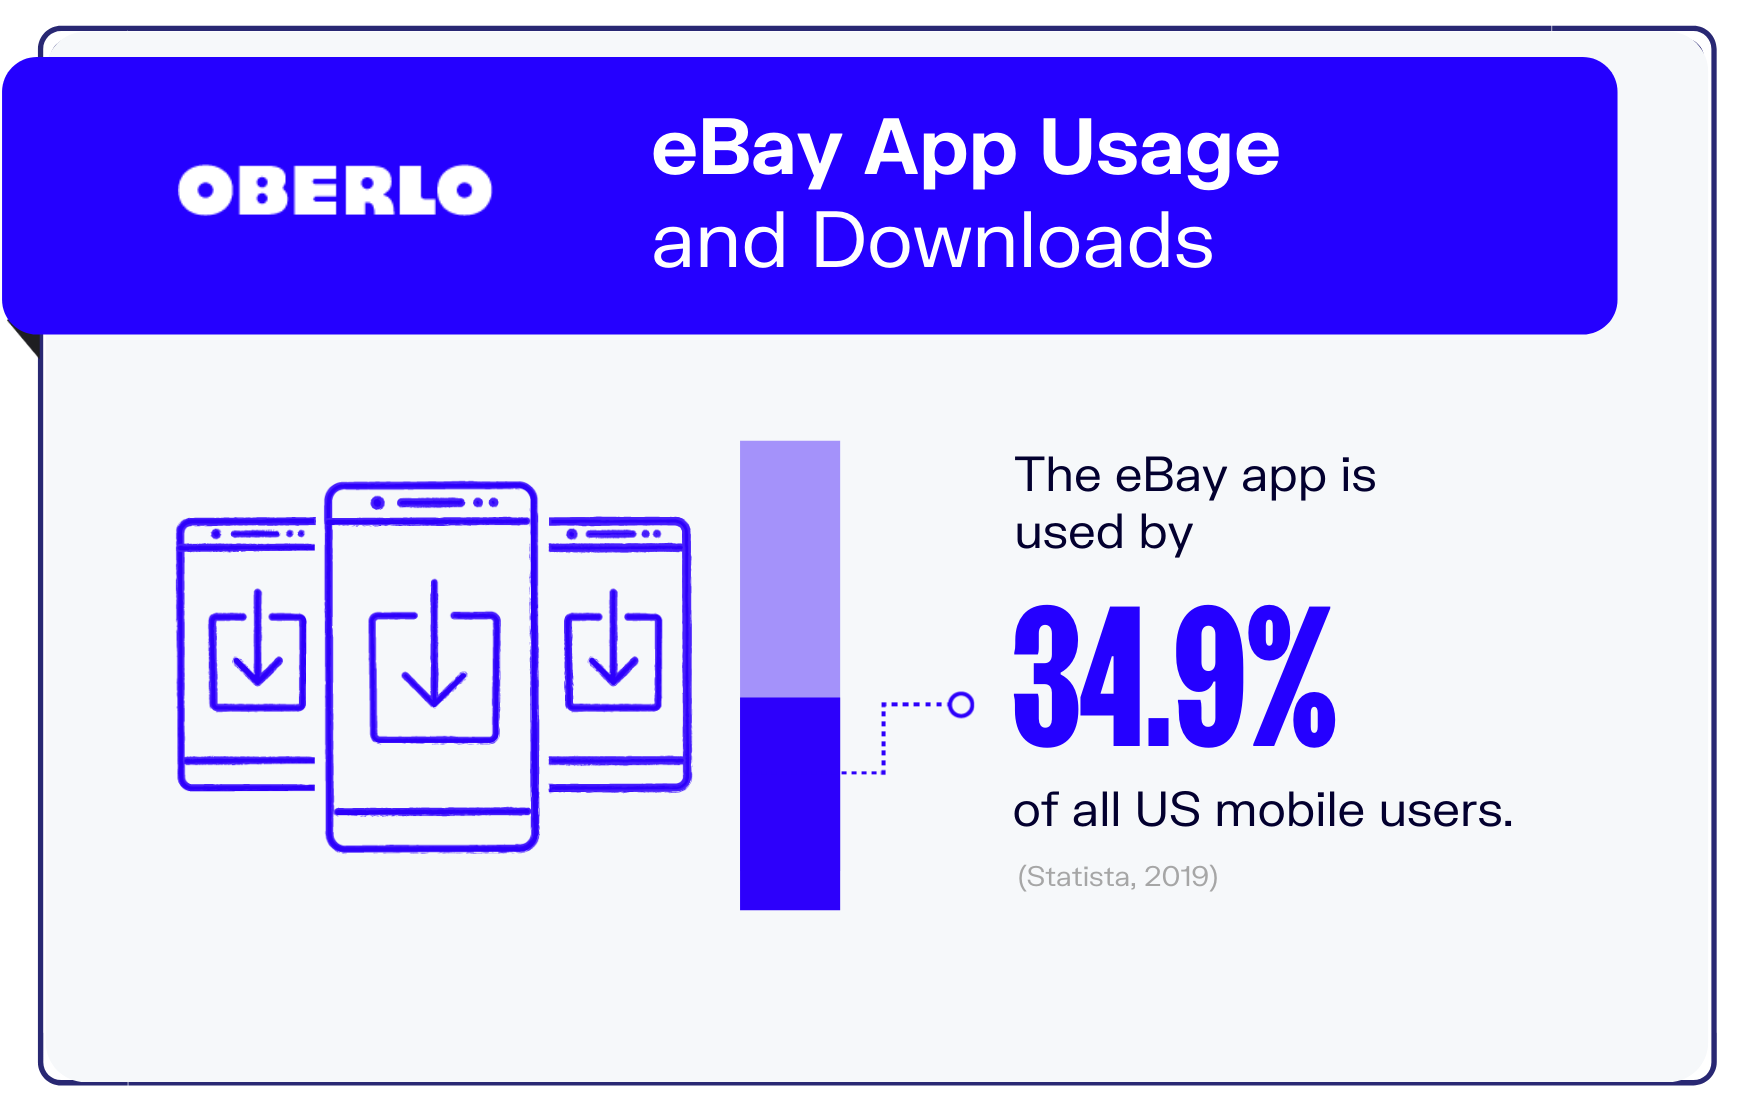 ebay statistics graphic 2